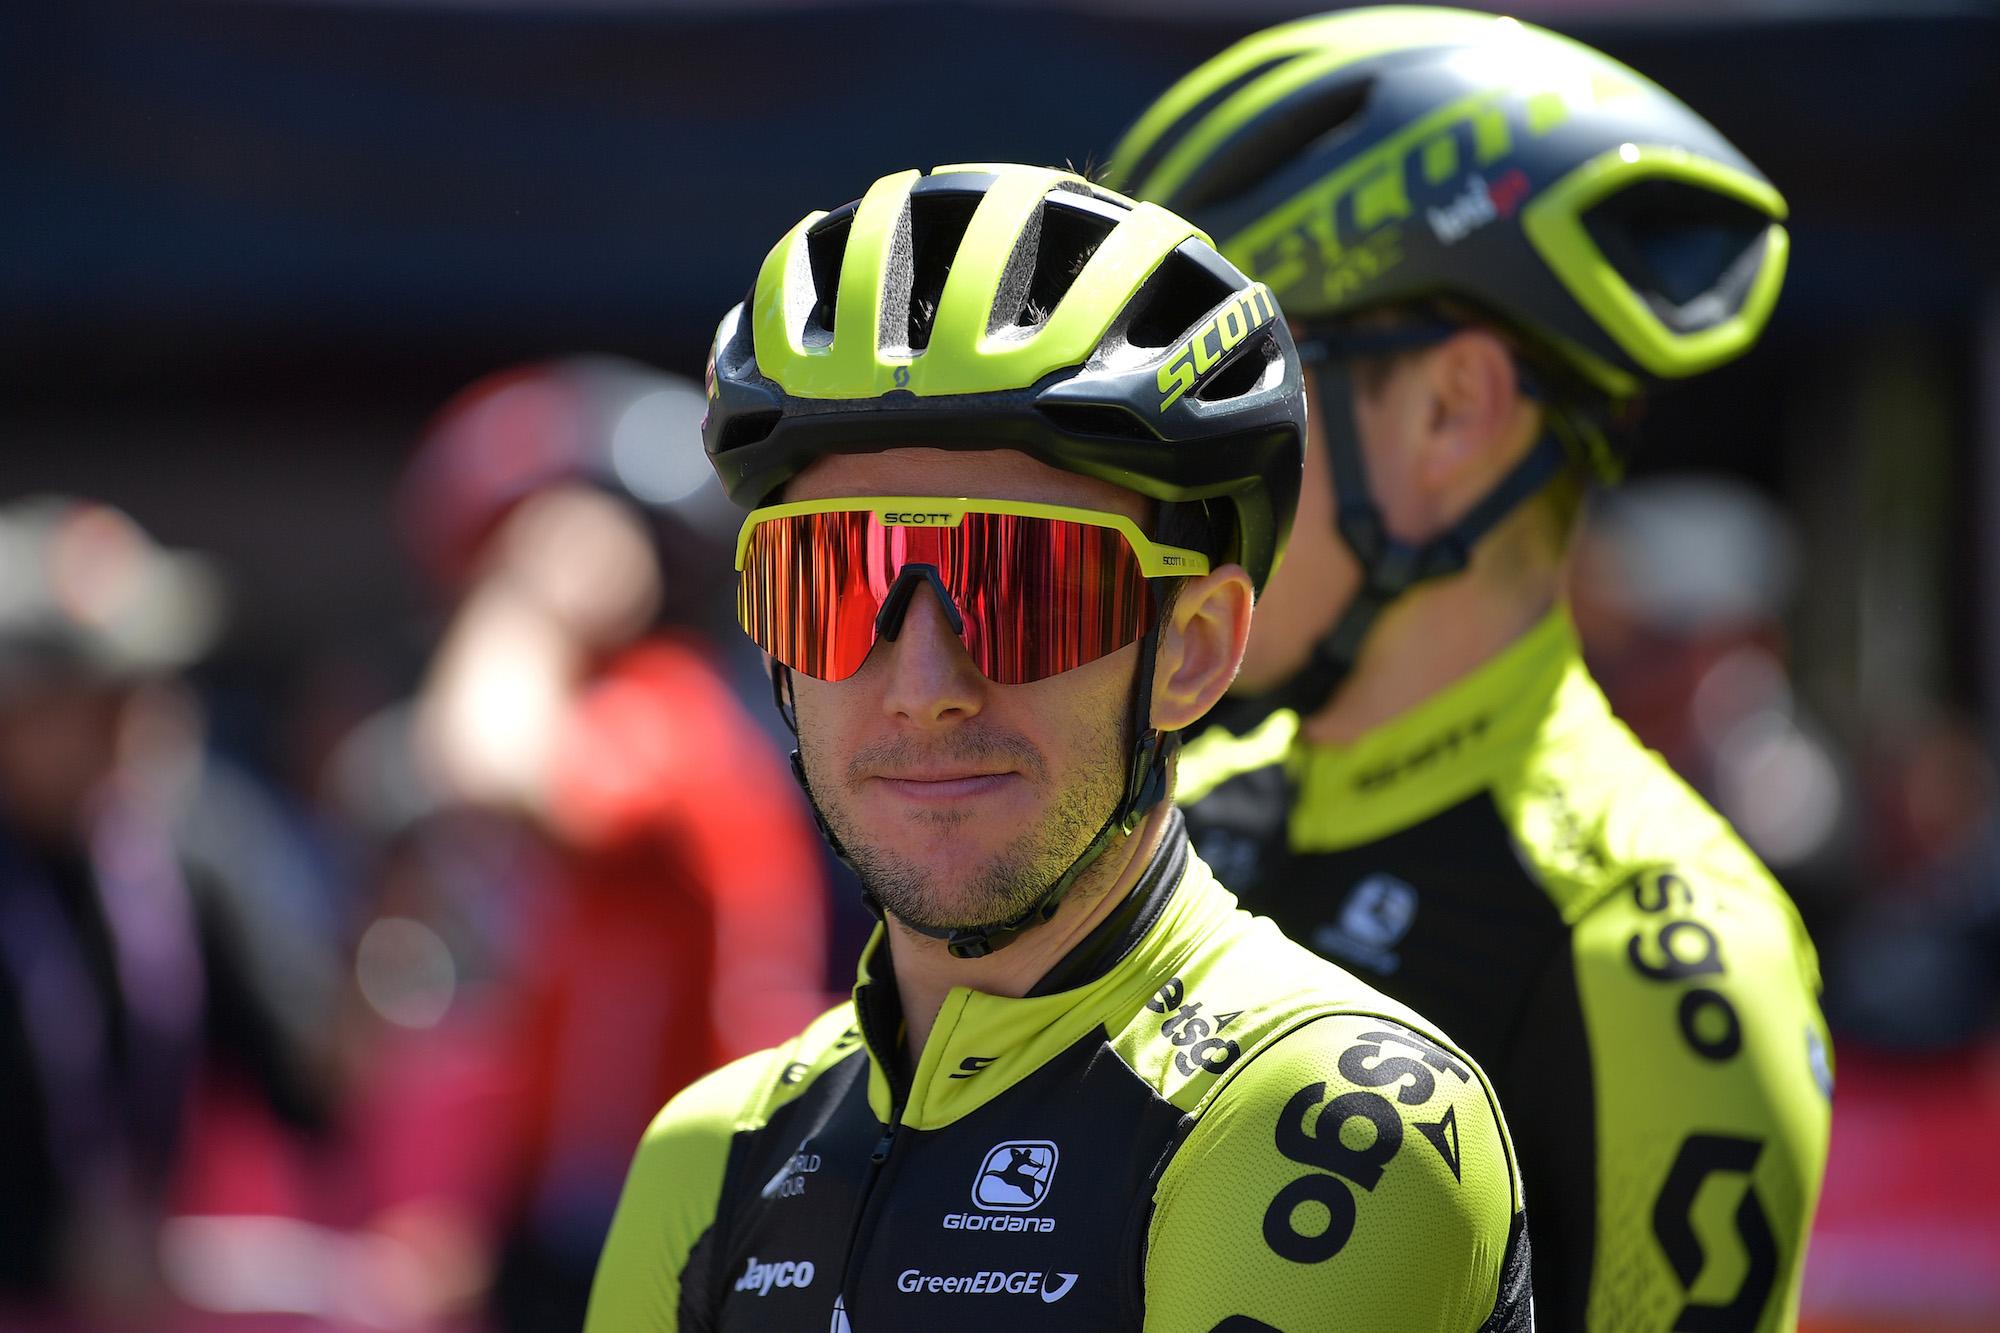 Simon Yates reflects on 'heart-breaking' Giro d'Italia 2019